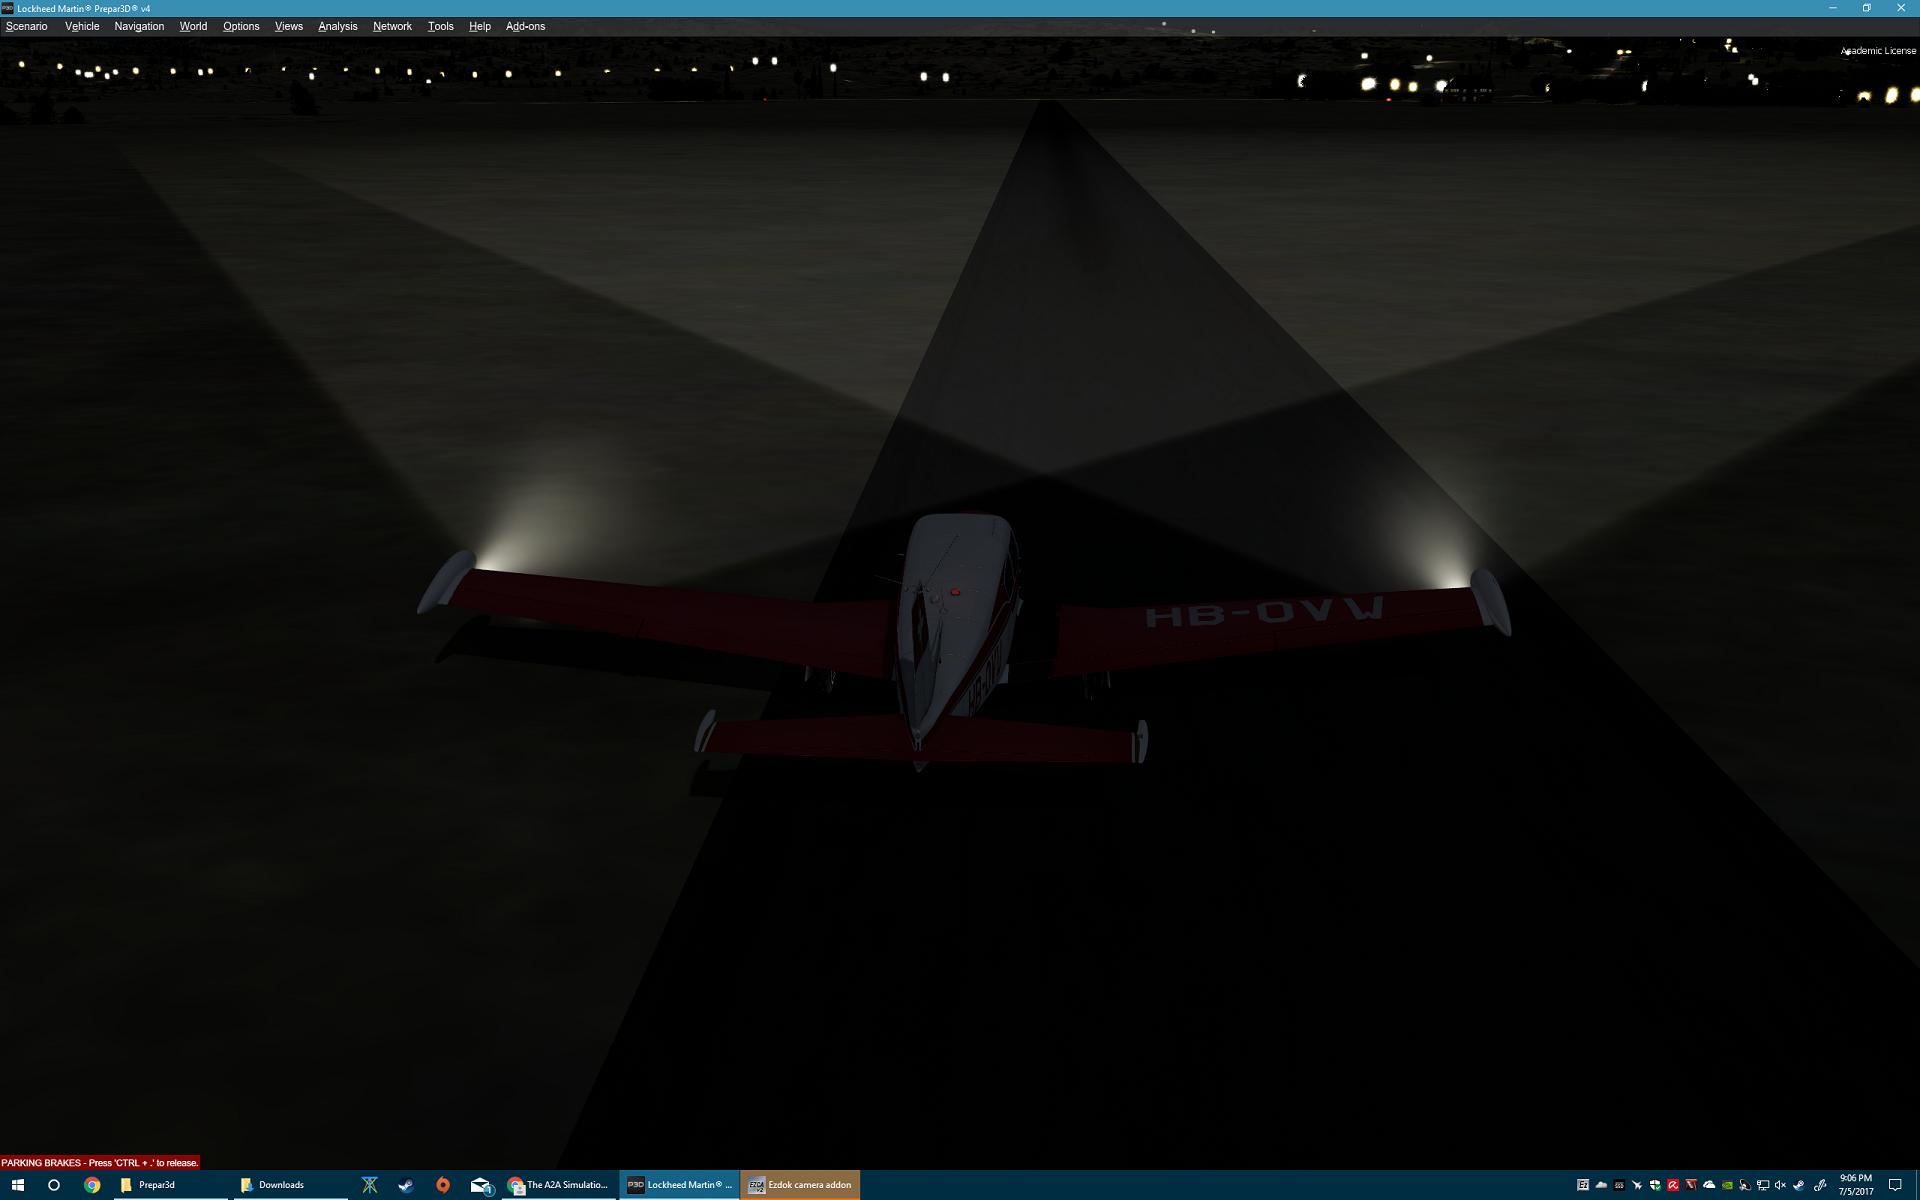 P3D v4 Comanche configurator has no landing lights - The A2A